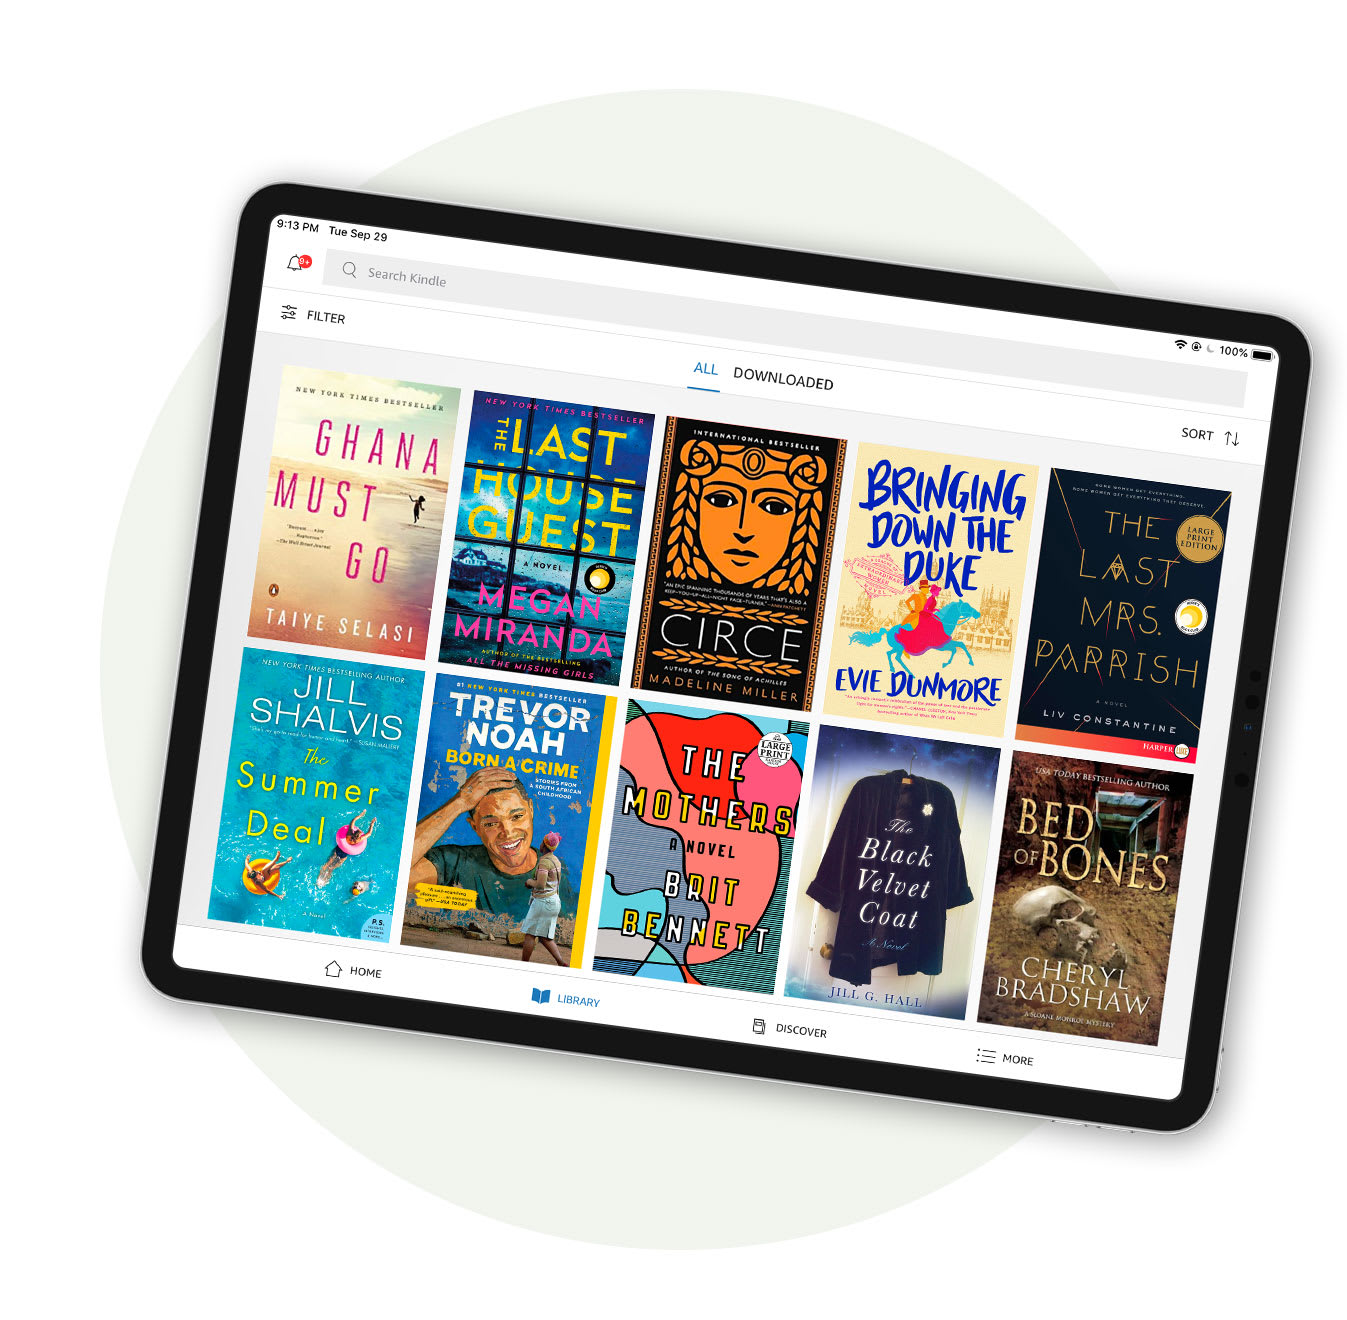 Books on an ipad